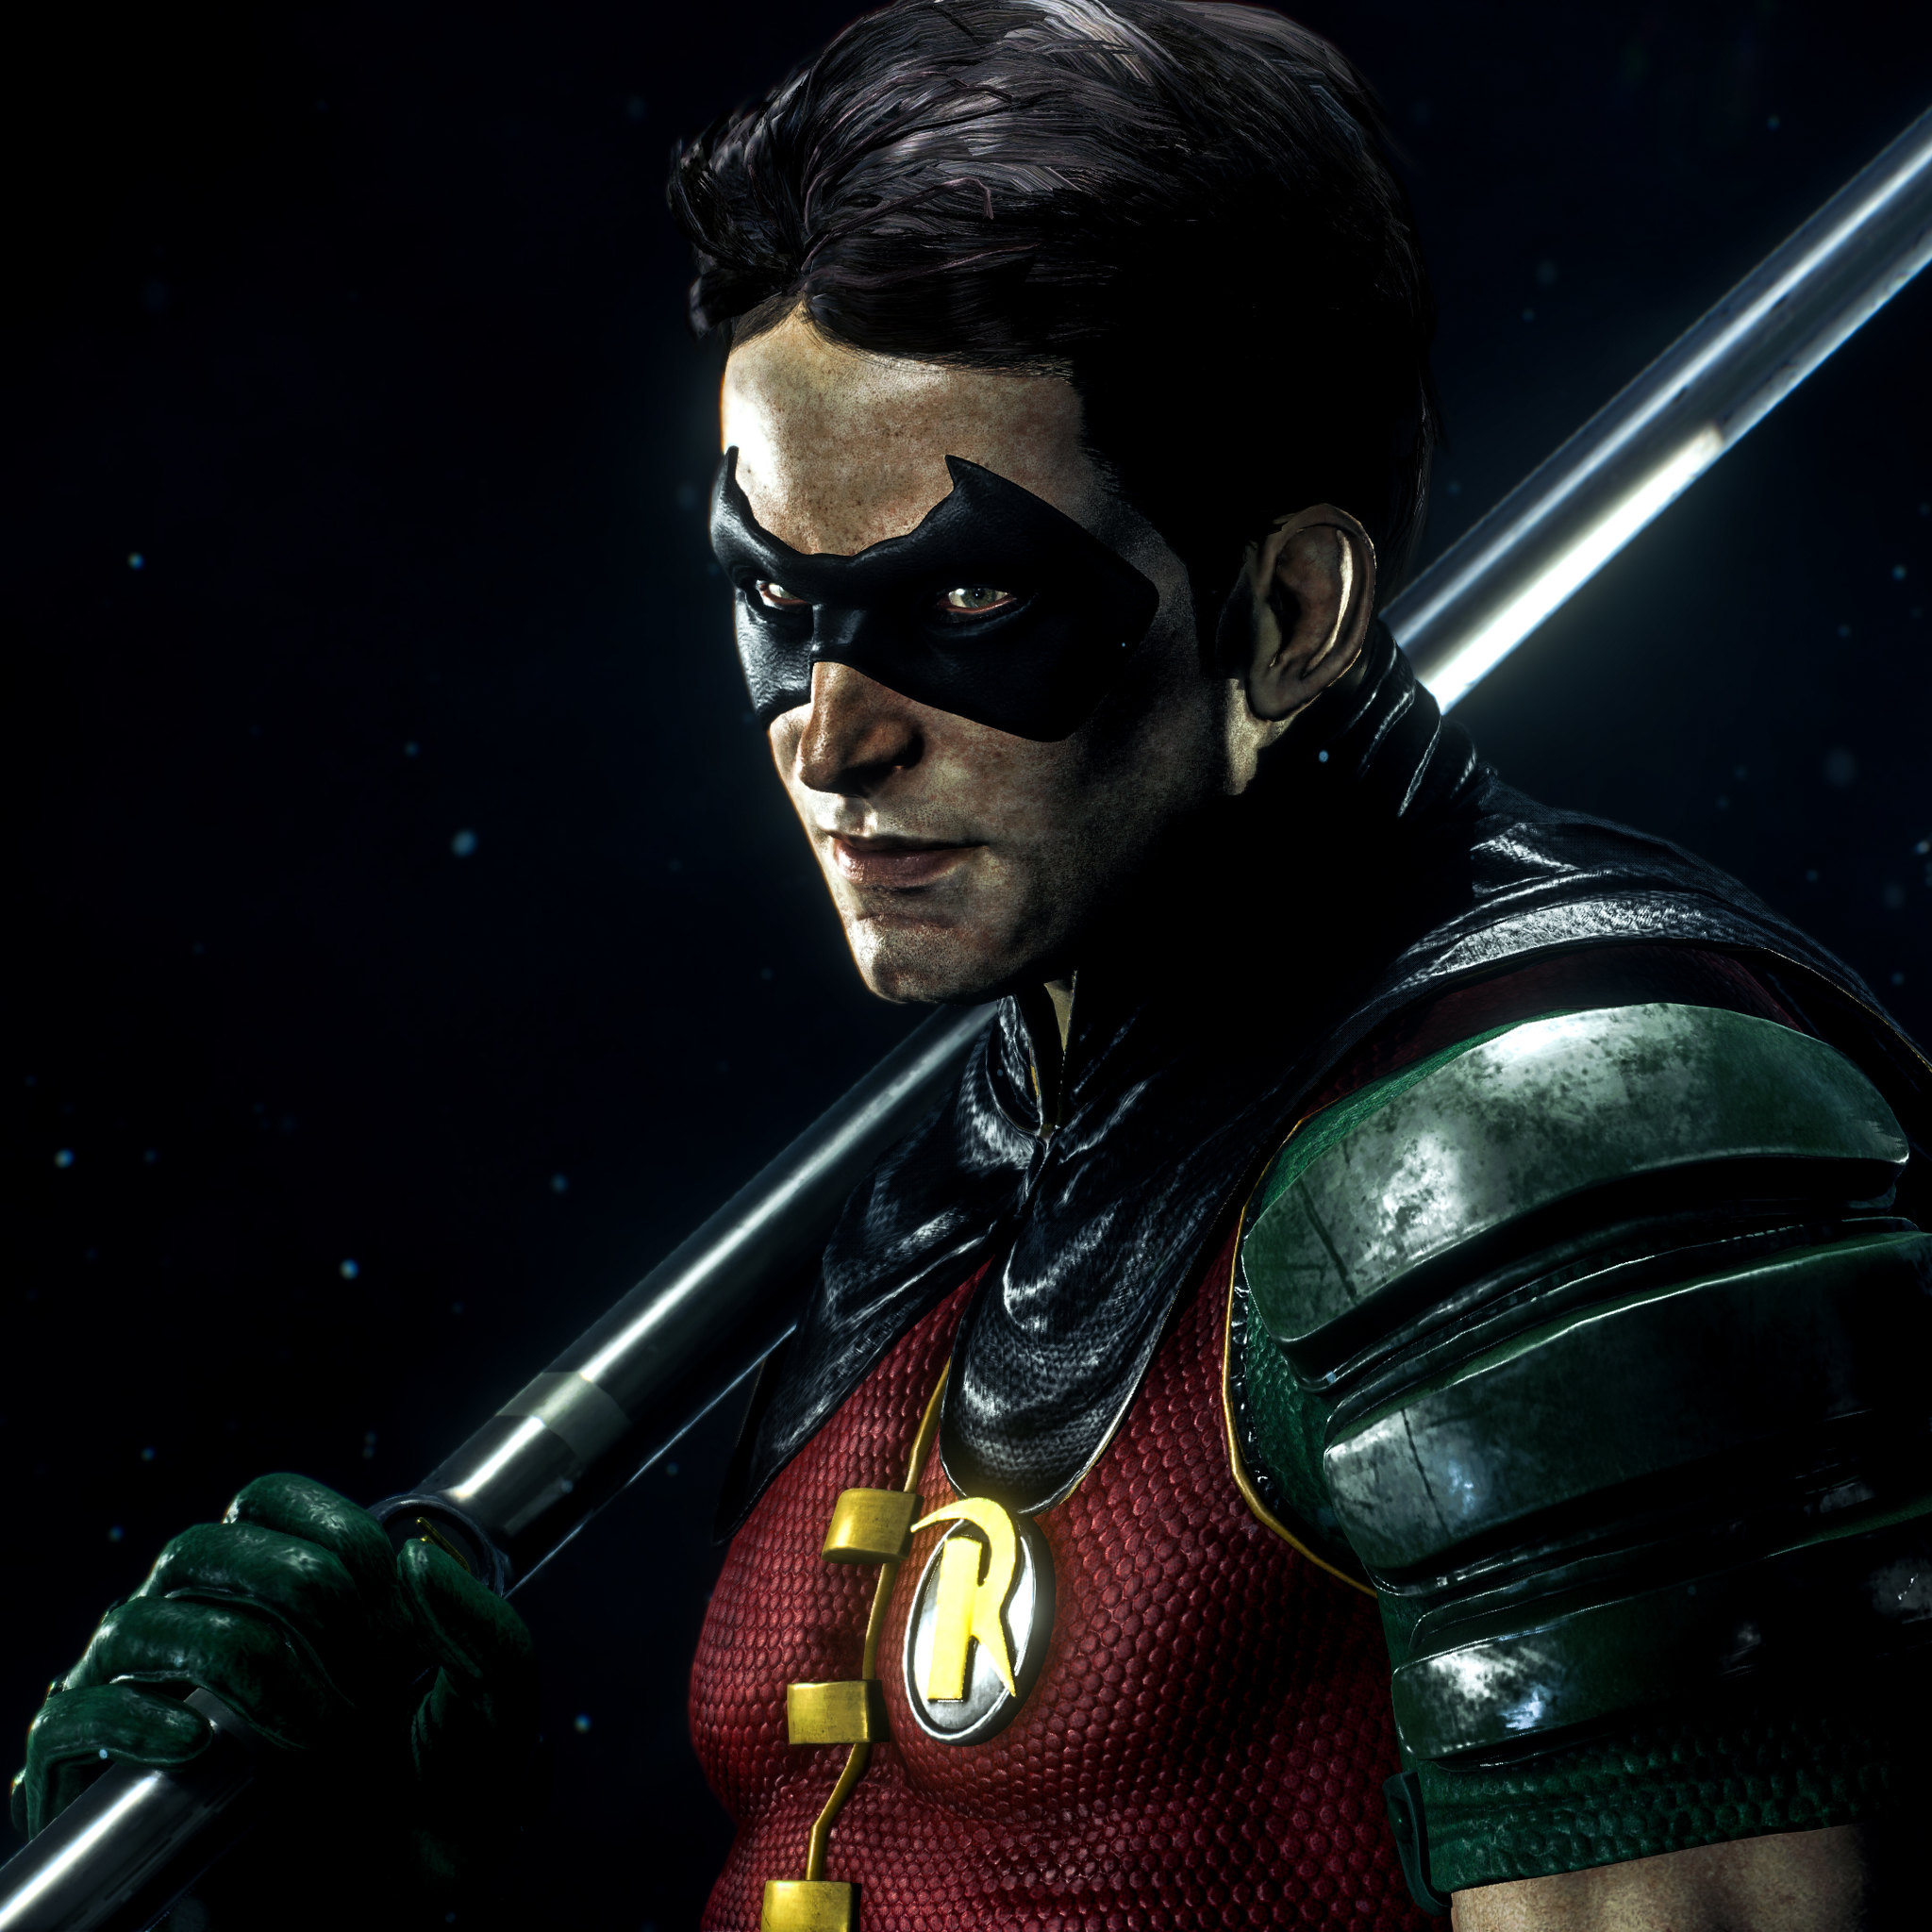 40207436082_28981e0811_k.jpg - Batman: Arkham Knight